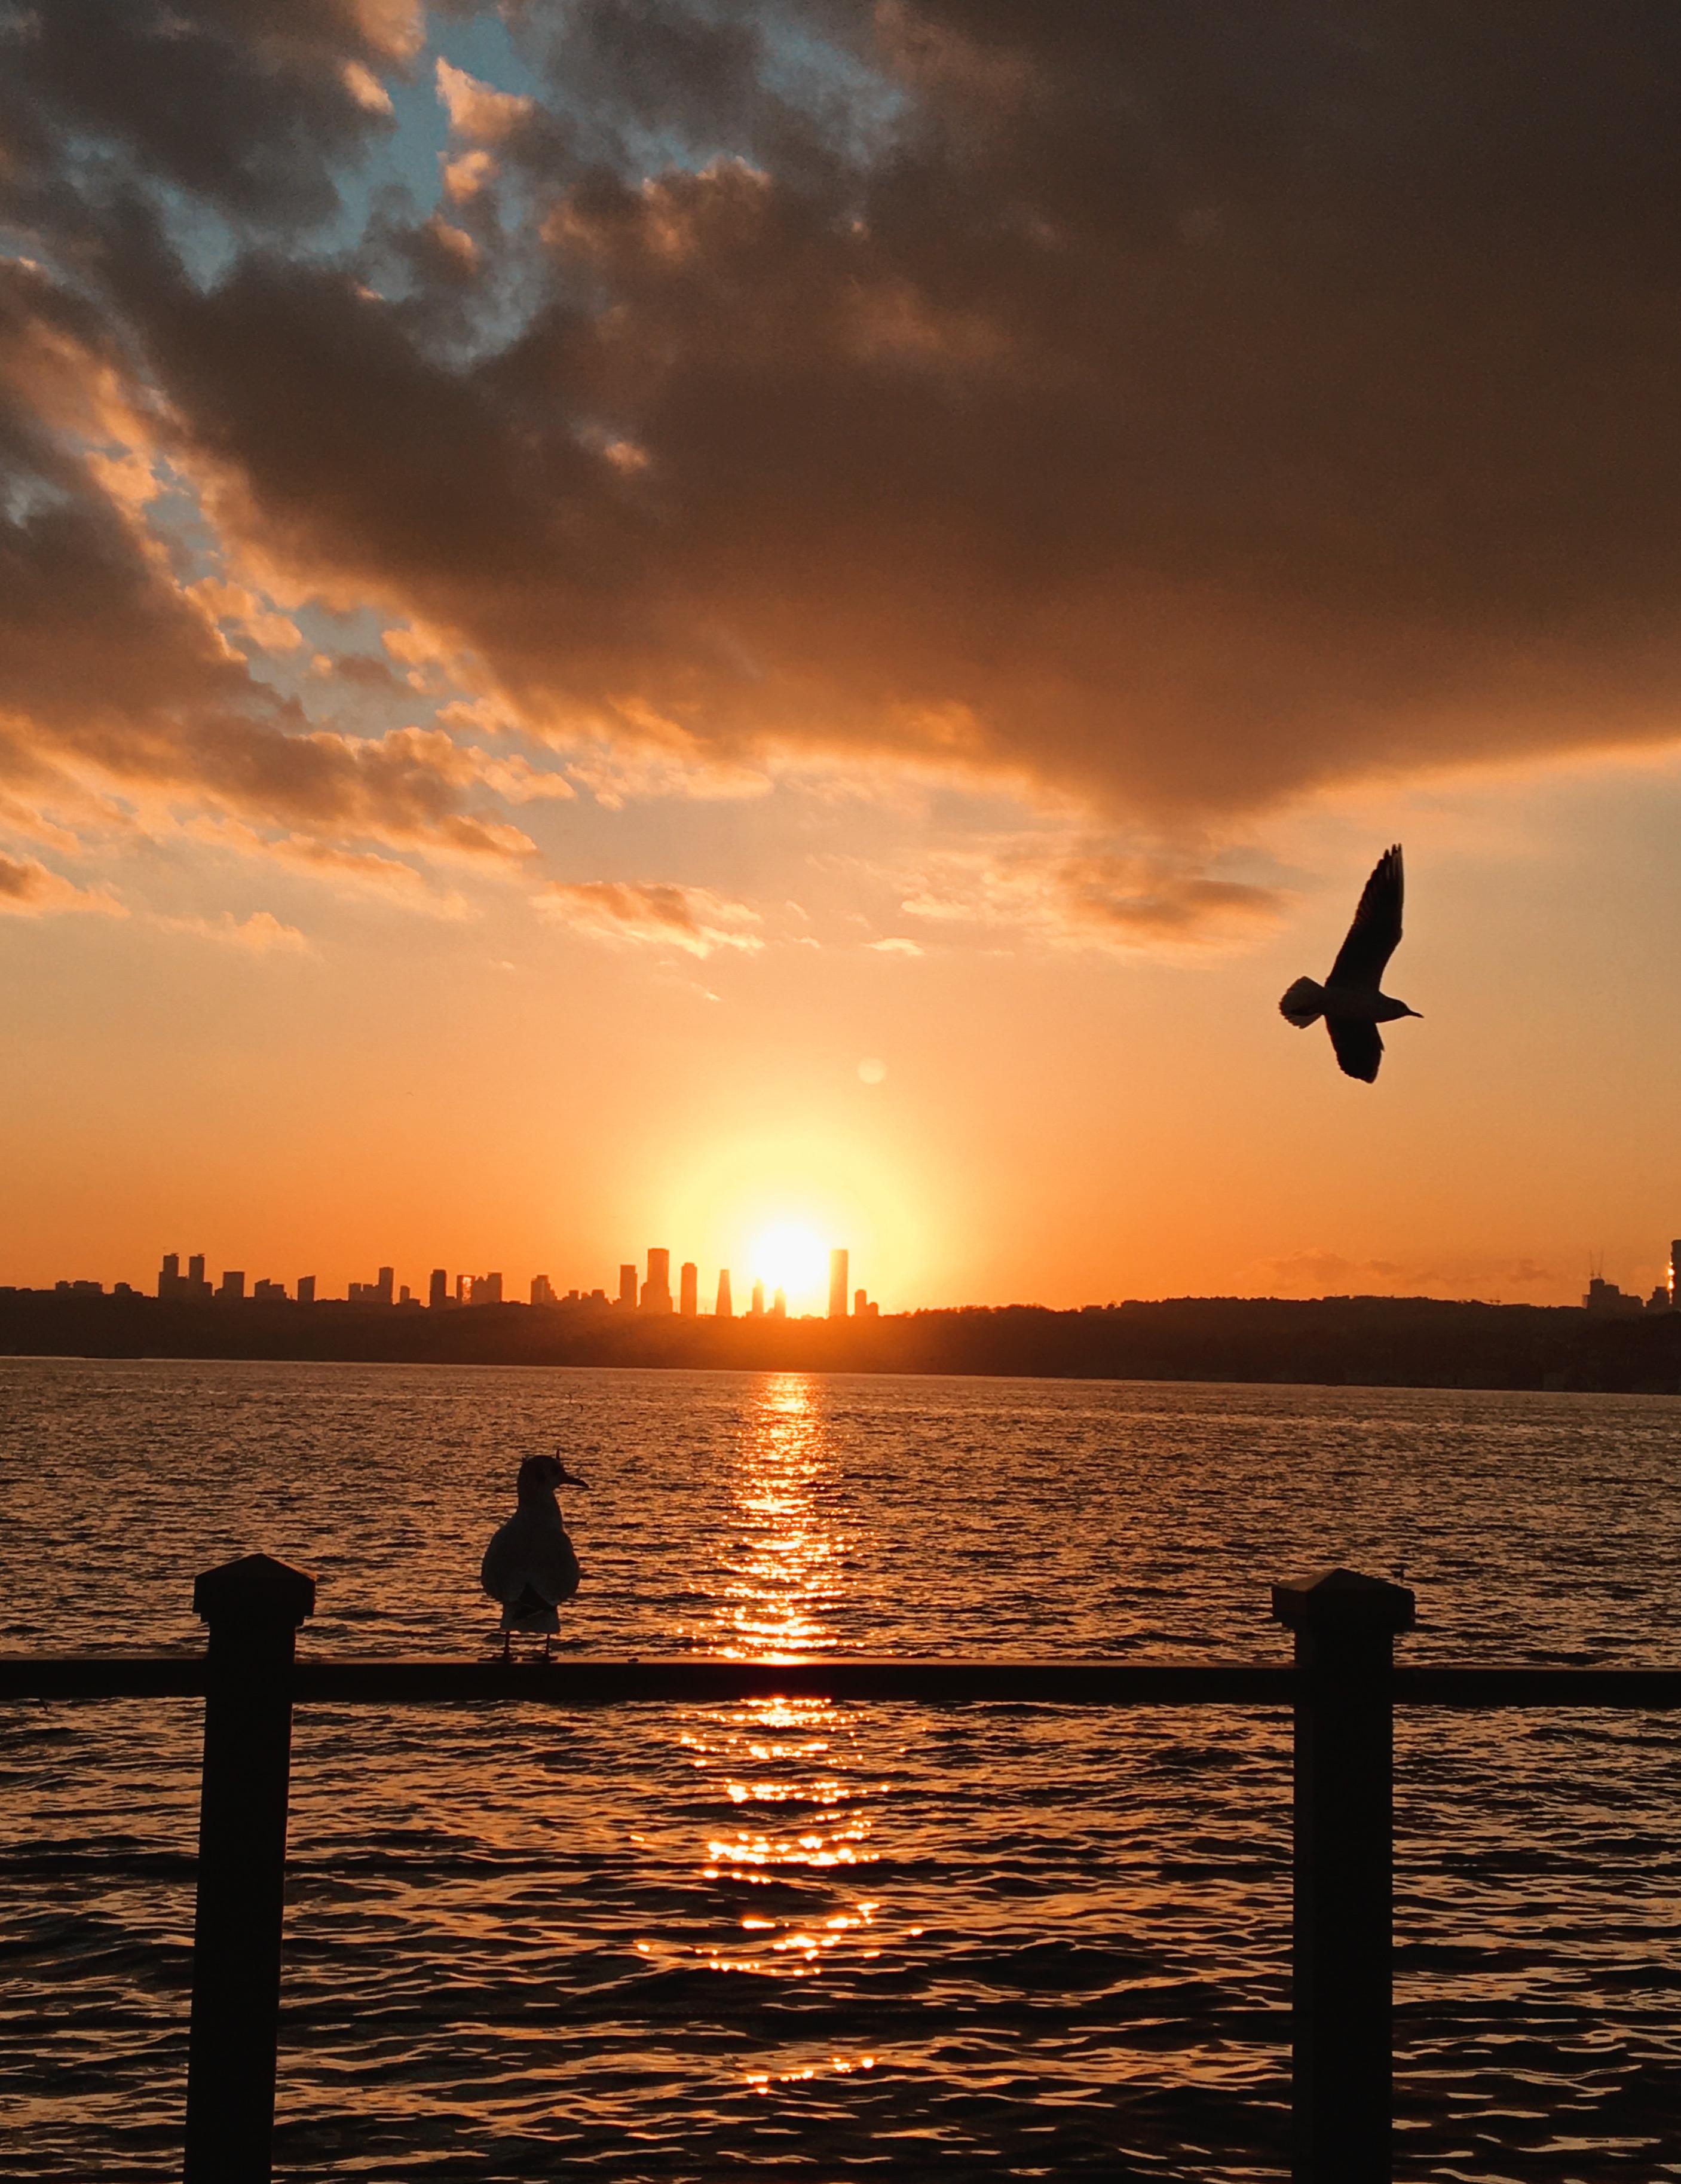 Beautiful sky ❤️ #photography #photographer #nature #sky #sun #sunset #followme #travel #traveller #fotografia #istanbul #turkey #beach #picsart #birds #a